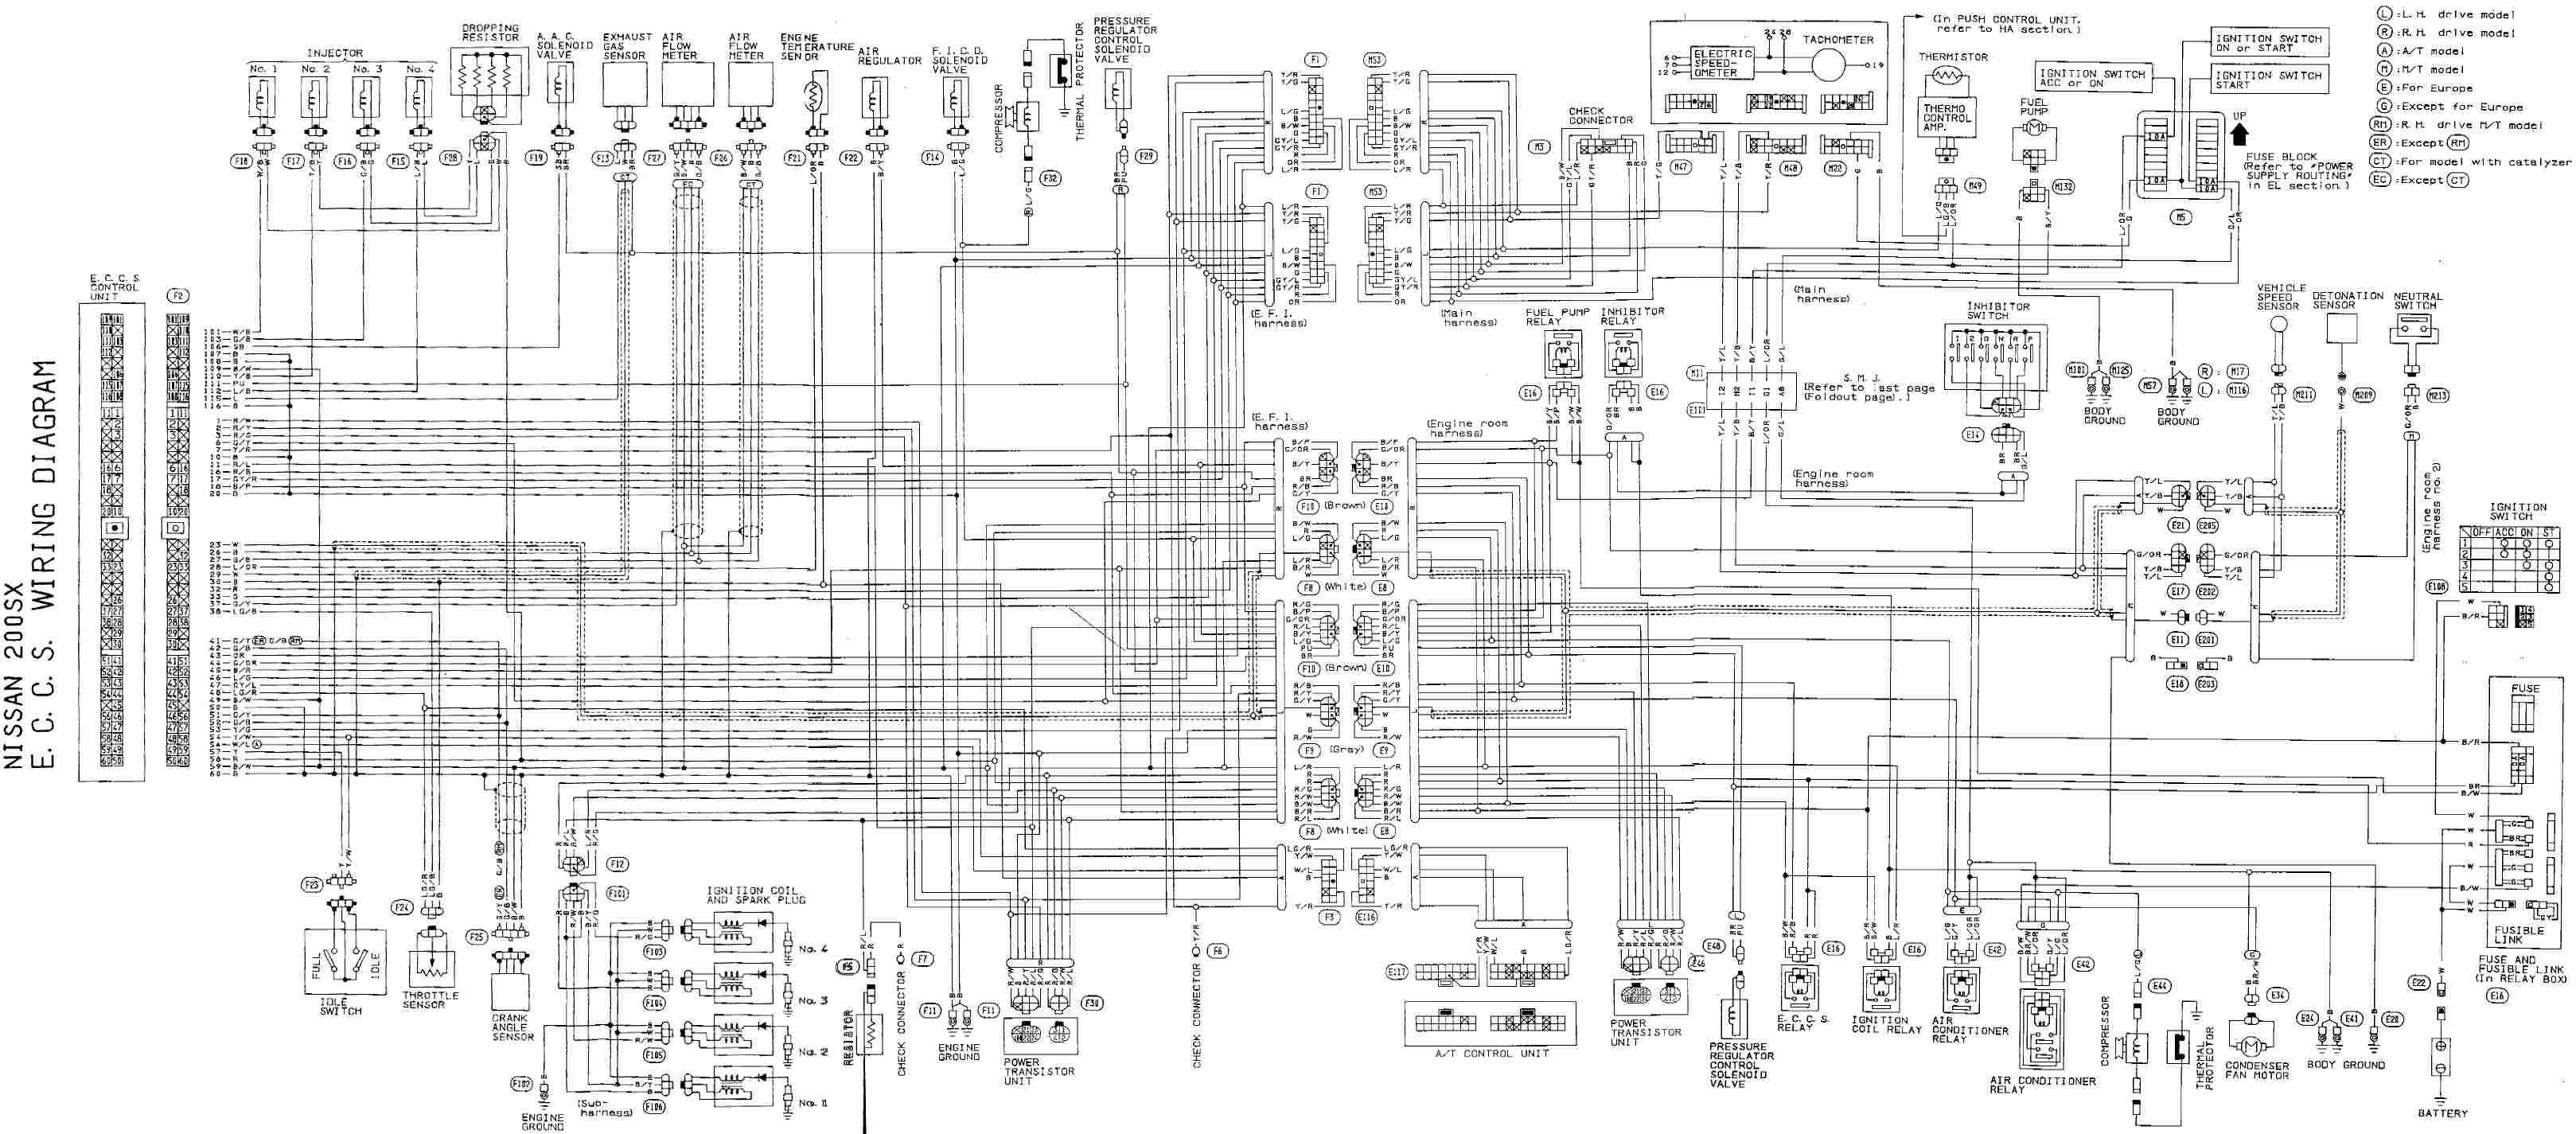 2008 Nissan Sentra Engine Diagram 2003 Nissan Sentra Wiring Diagram ...